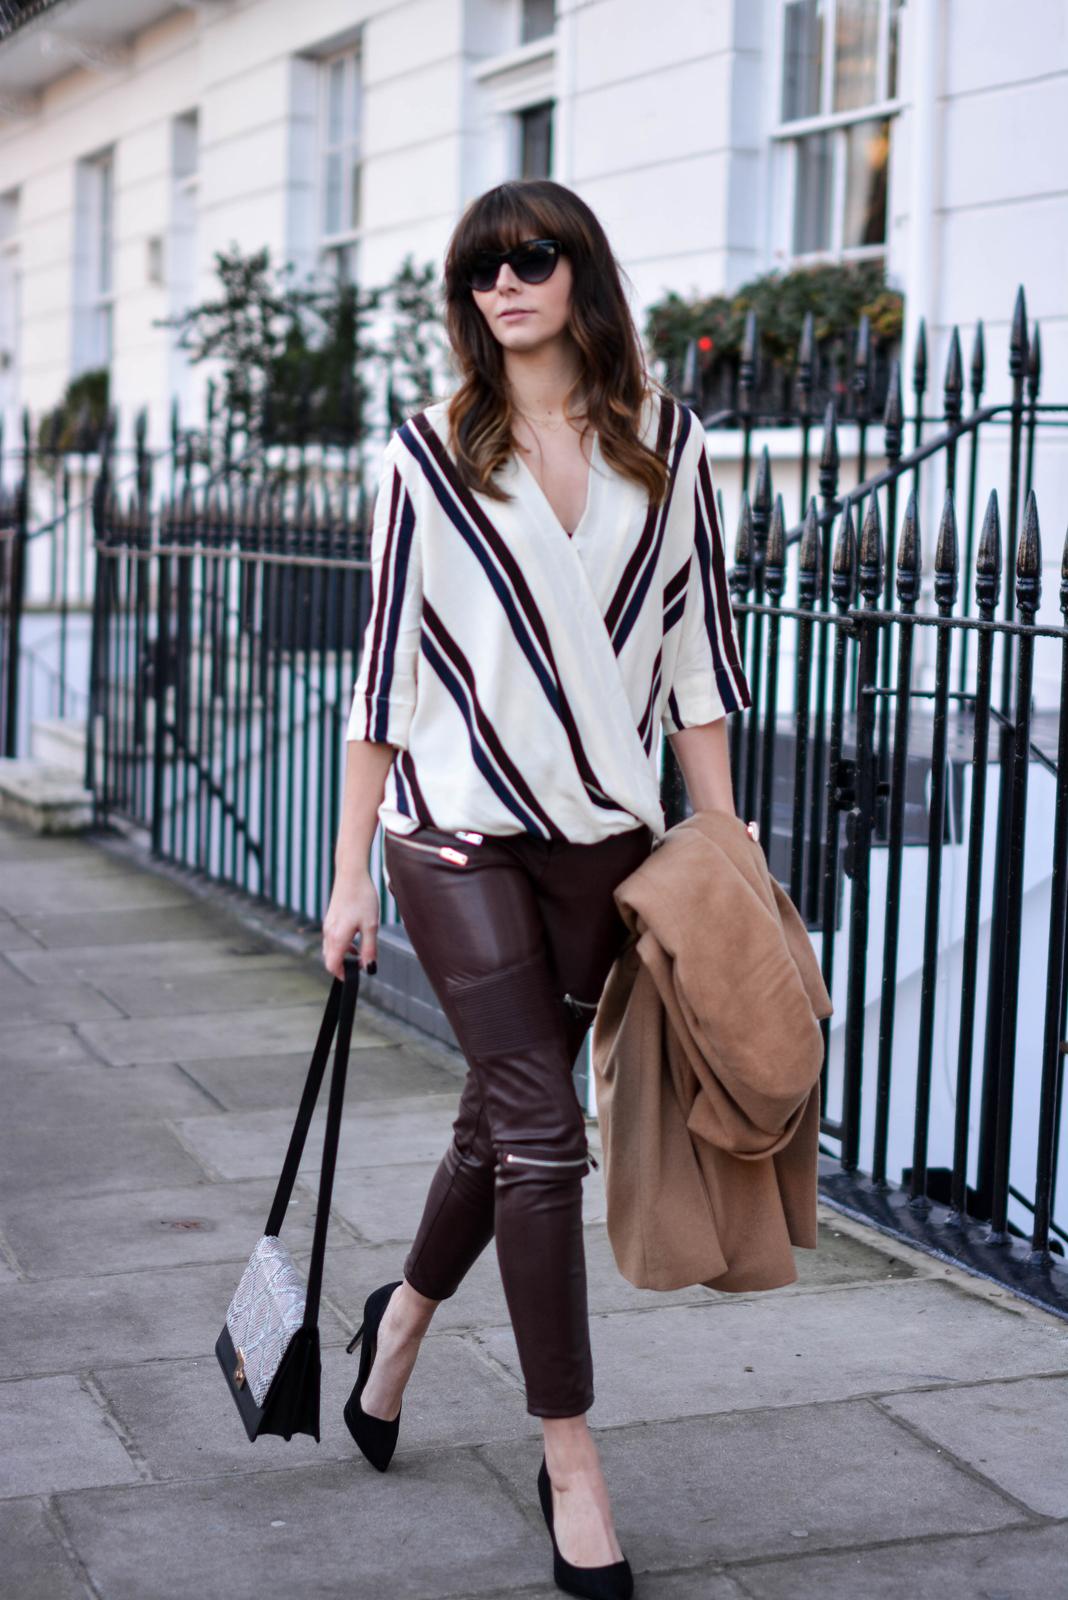 EJSTYLE - Topshop stripe drapped shirt top, River Island camel coat, Zara burgundy biker trousers faux leather, Snakeskin shoulder bag, OOTD, fashion blogger, chic outfit, Emma Hill